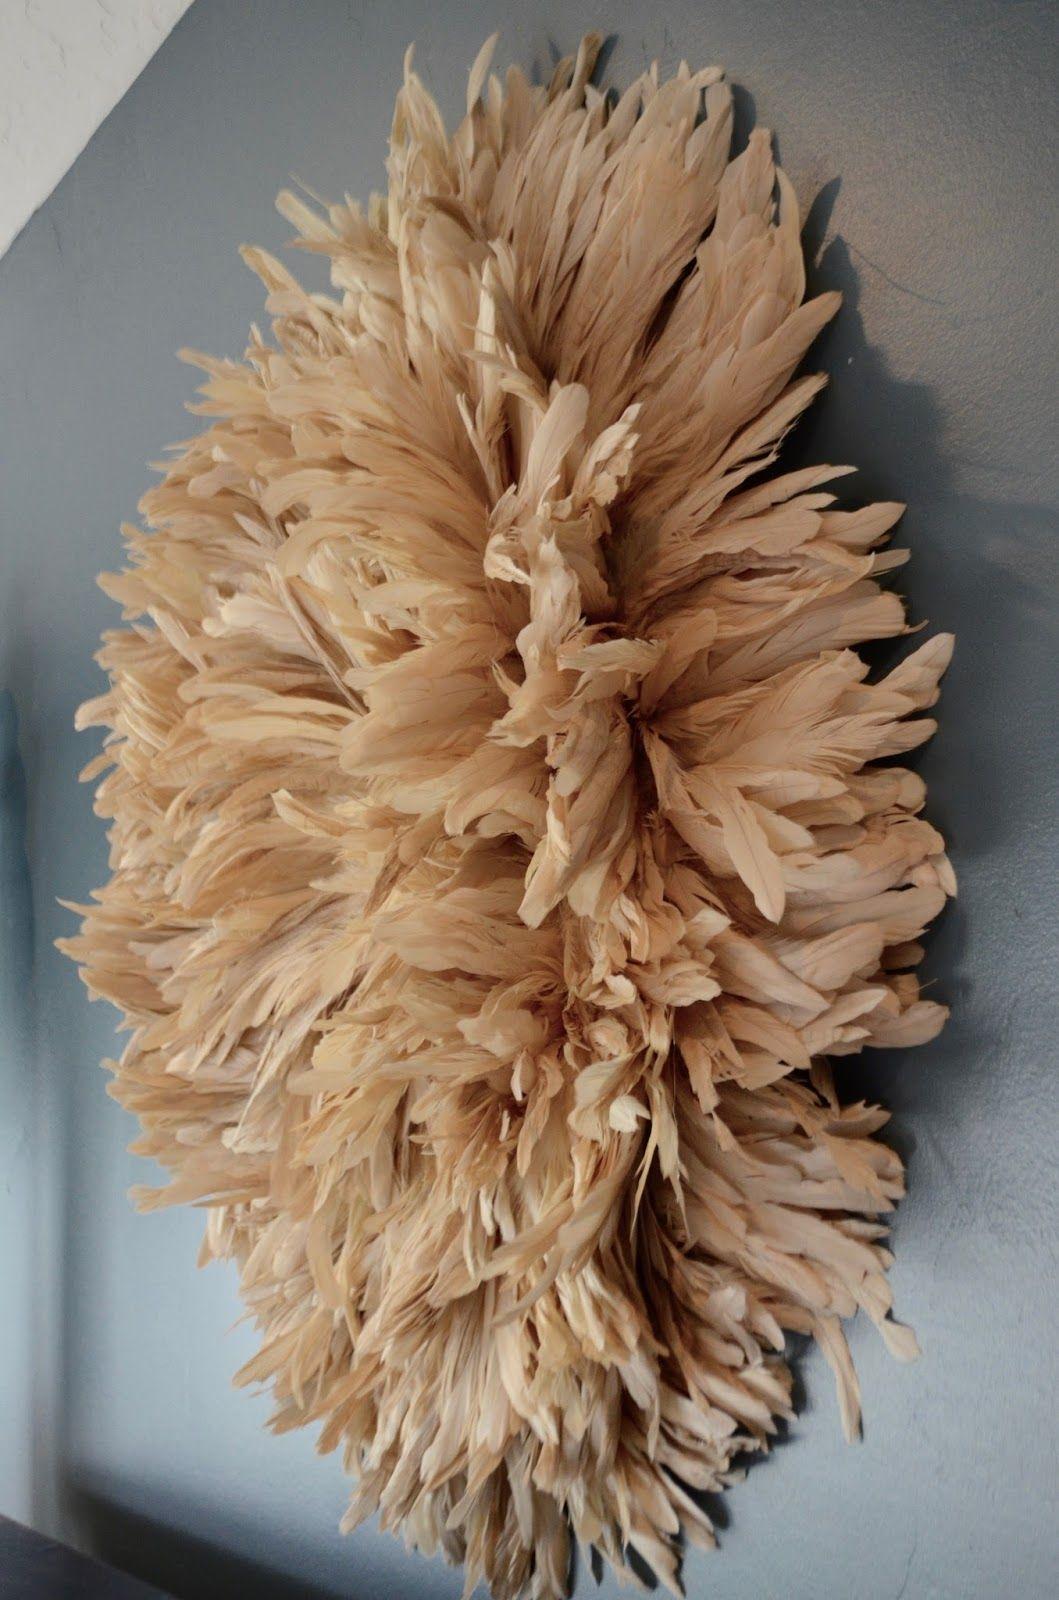 diy diy juju hat hat feathers tutorial juju hat tutorial how diy diy juju hat hat feathers tutorial juju hat tutorial